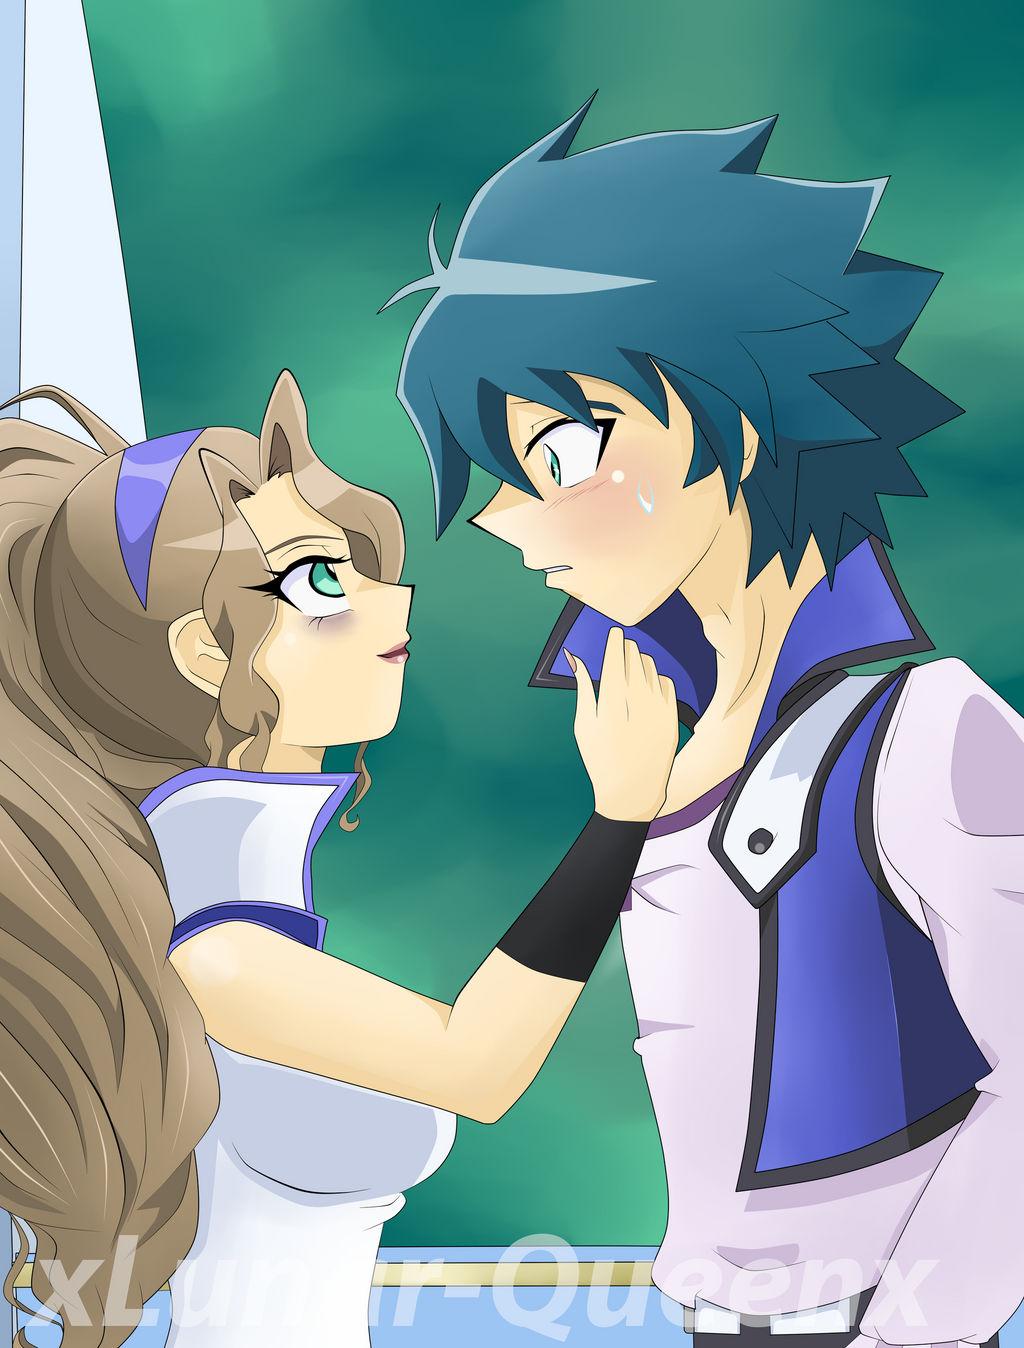 671 Florges by PaMeLaEnGeL   Pokemon, Anime, Deviantart